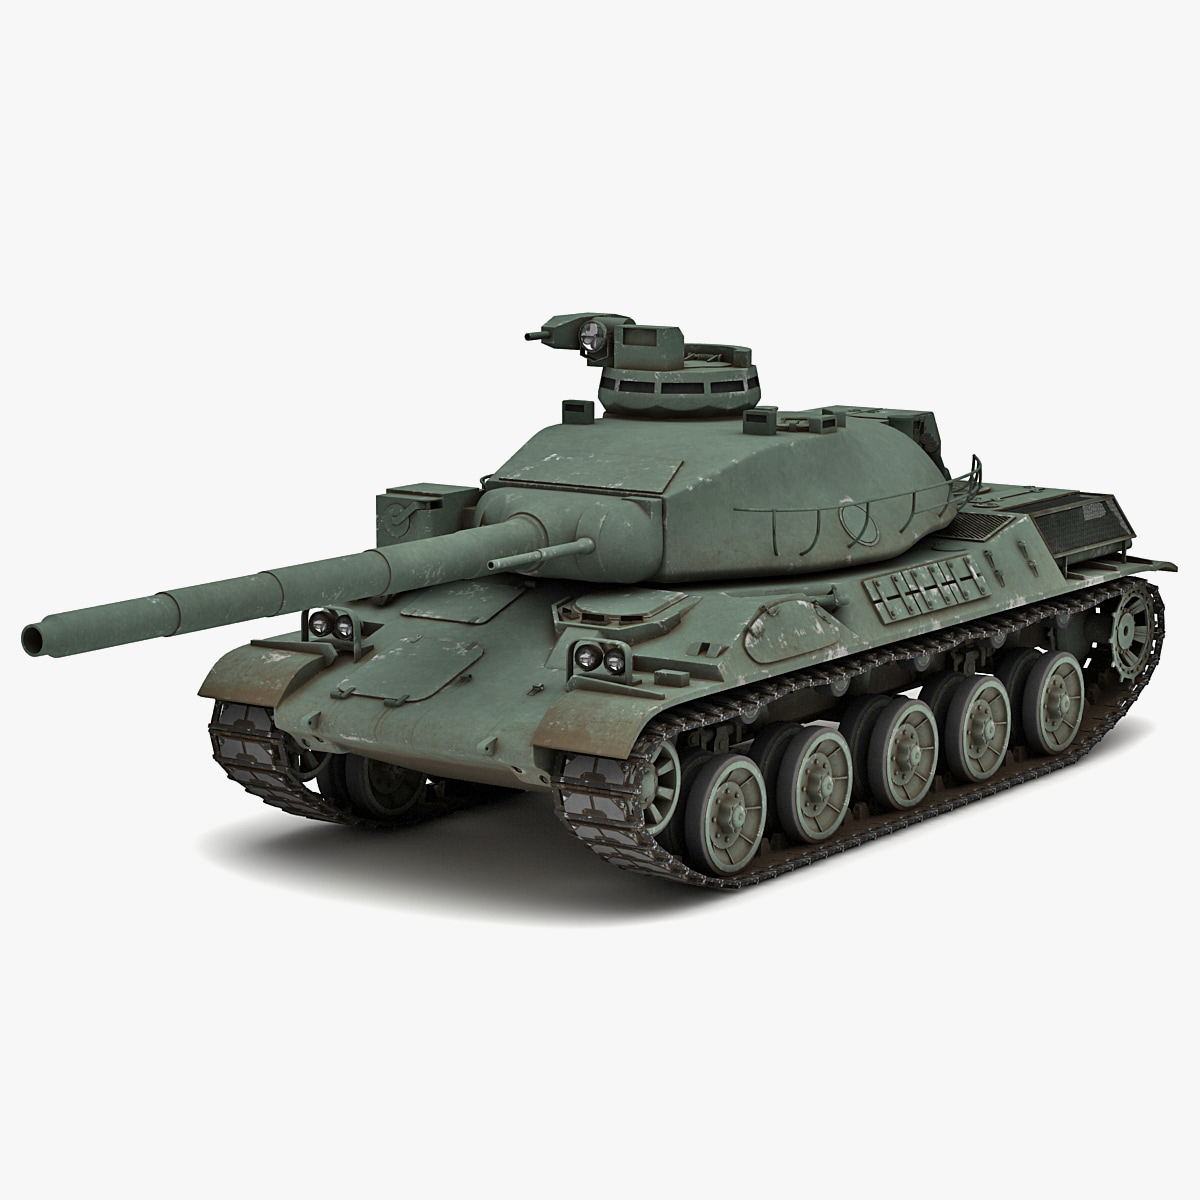 180744_AMX-32_France_Main_Battle_Tank_2___0001.jpg